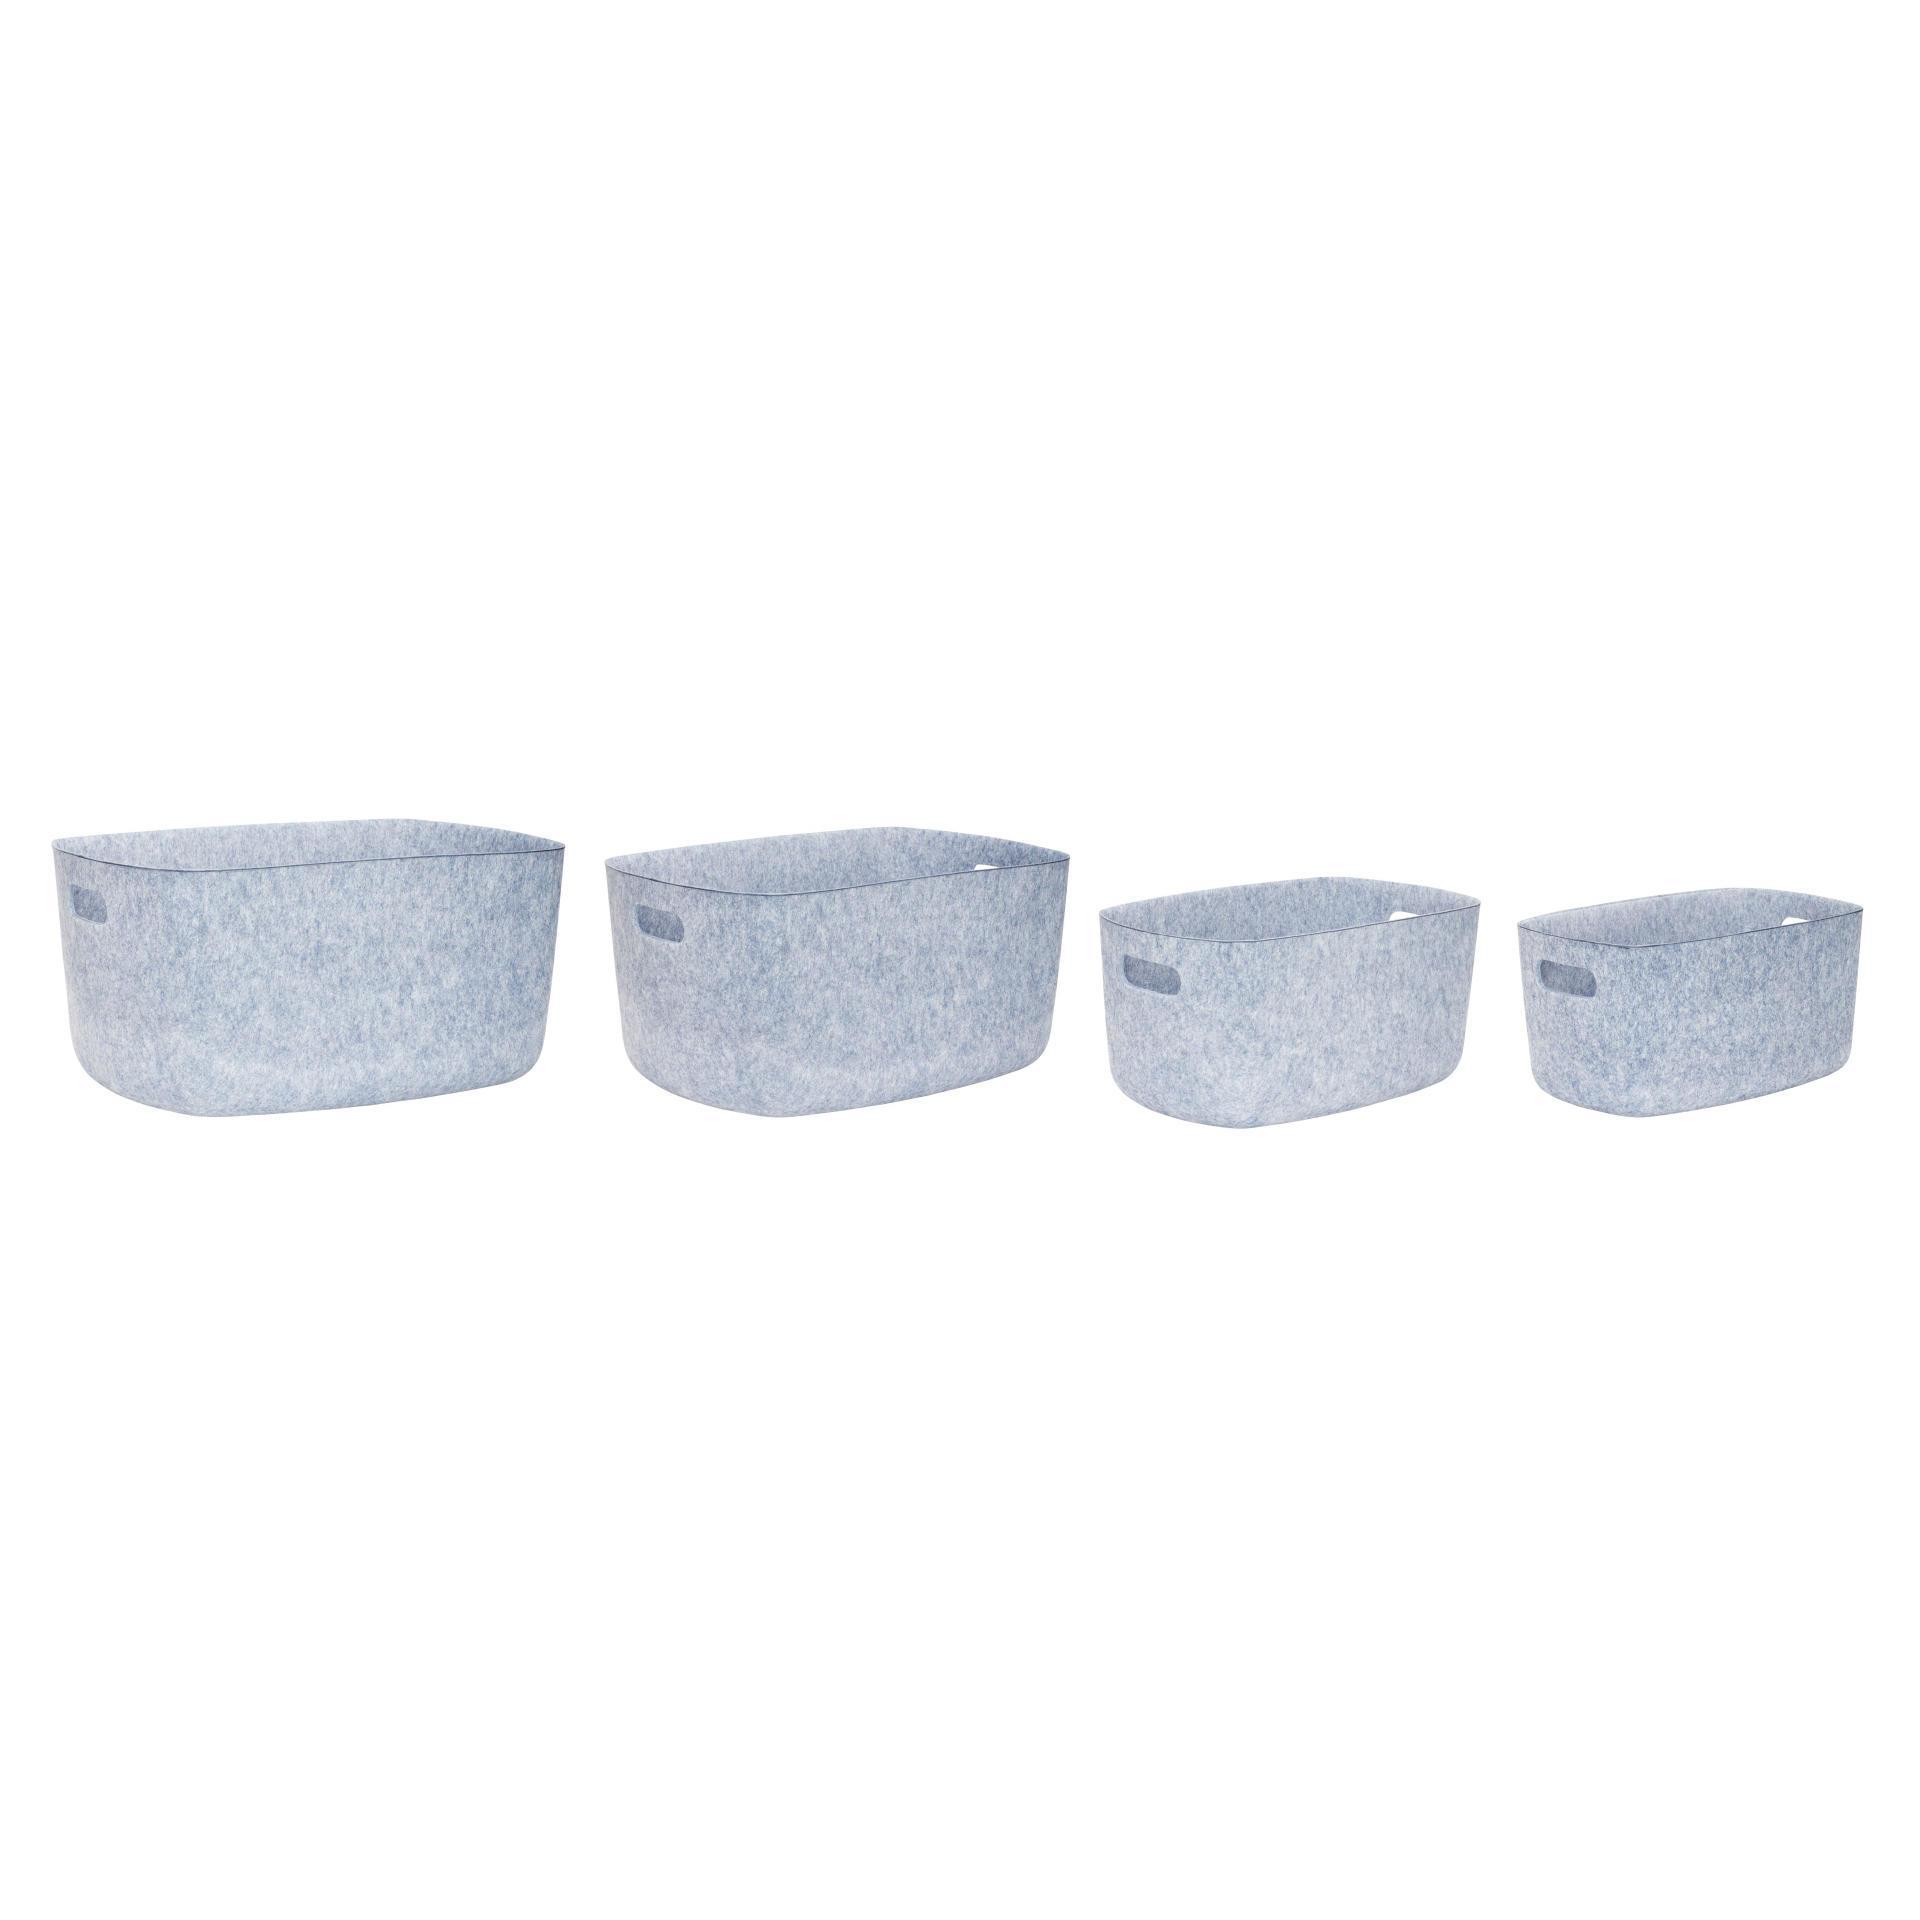 Hübsch Úložný box Felt Bue Varianta L, modrá barva, šedá barva, plast, textil